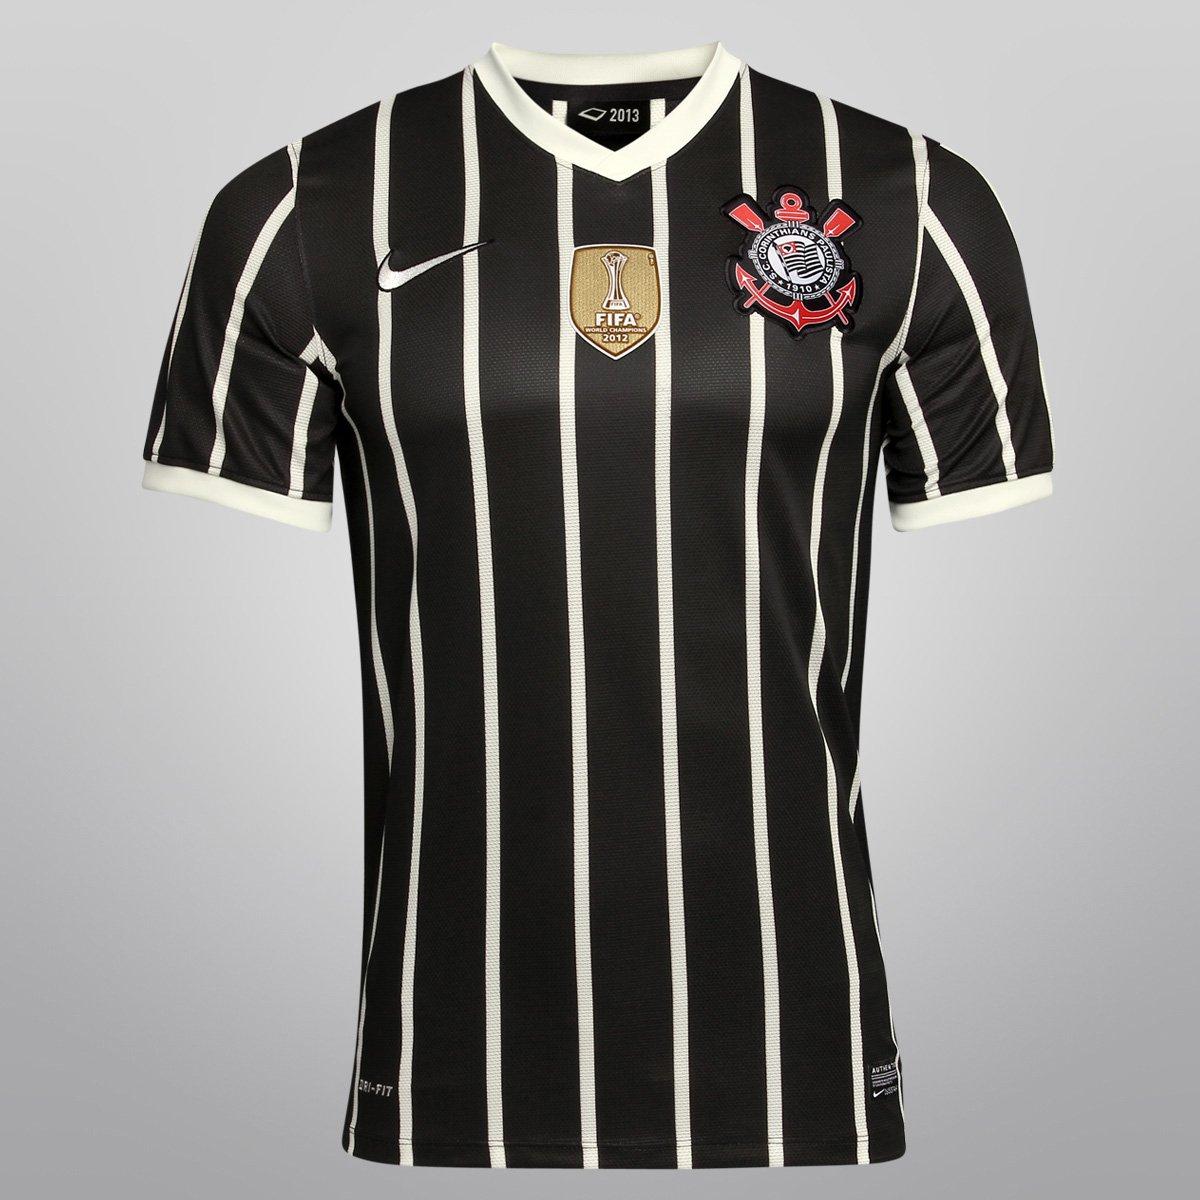 68055ec7af Camisa Nike Corinthians II 2013 s nº - Ed. Bicampeão Mundial - Compre Agora